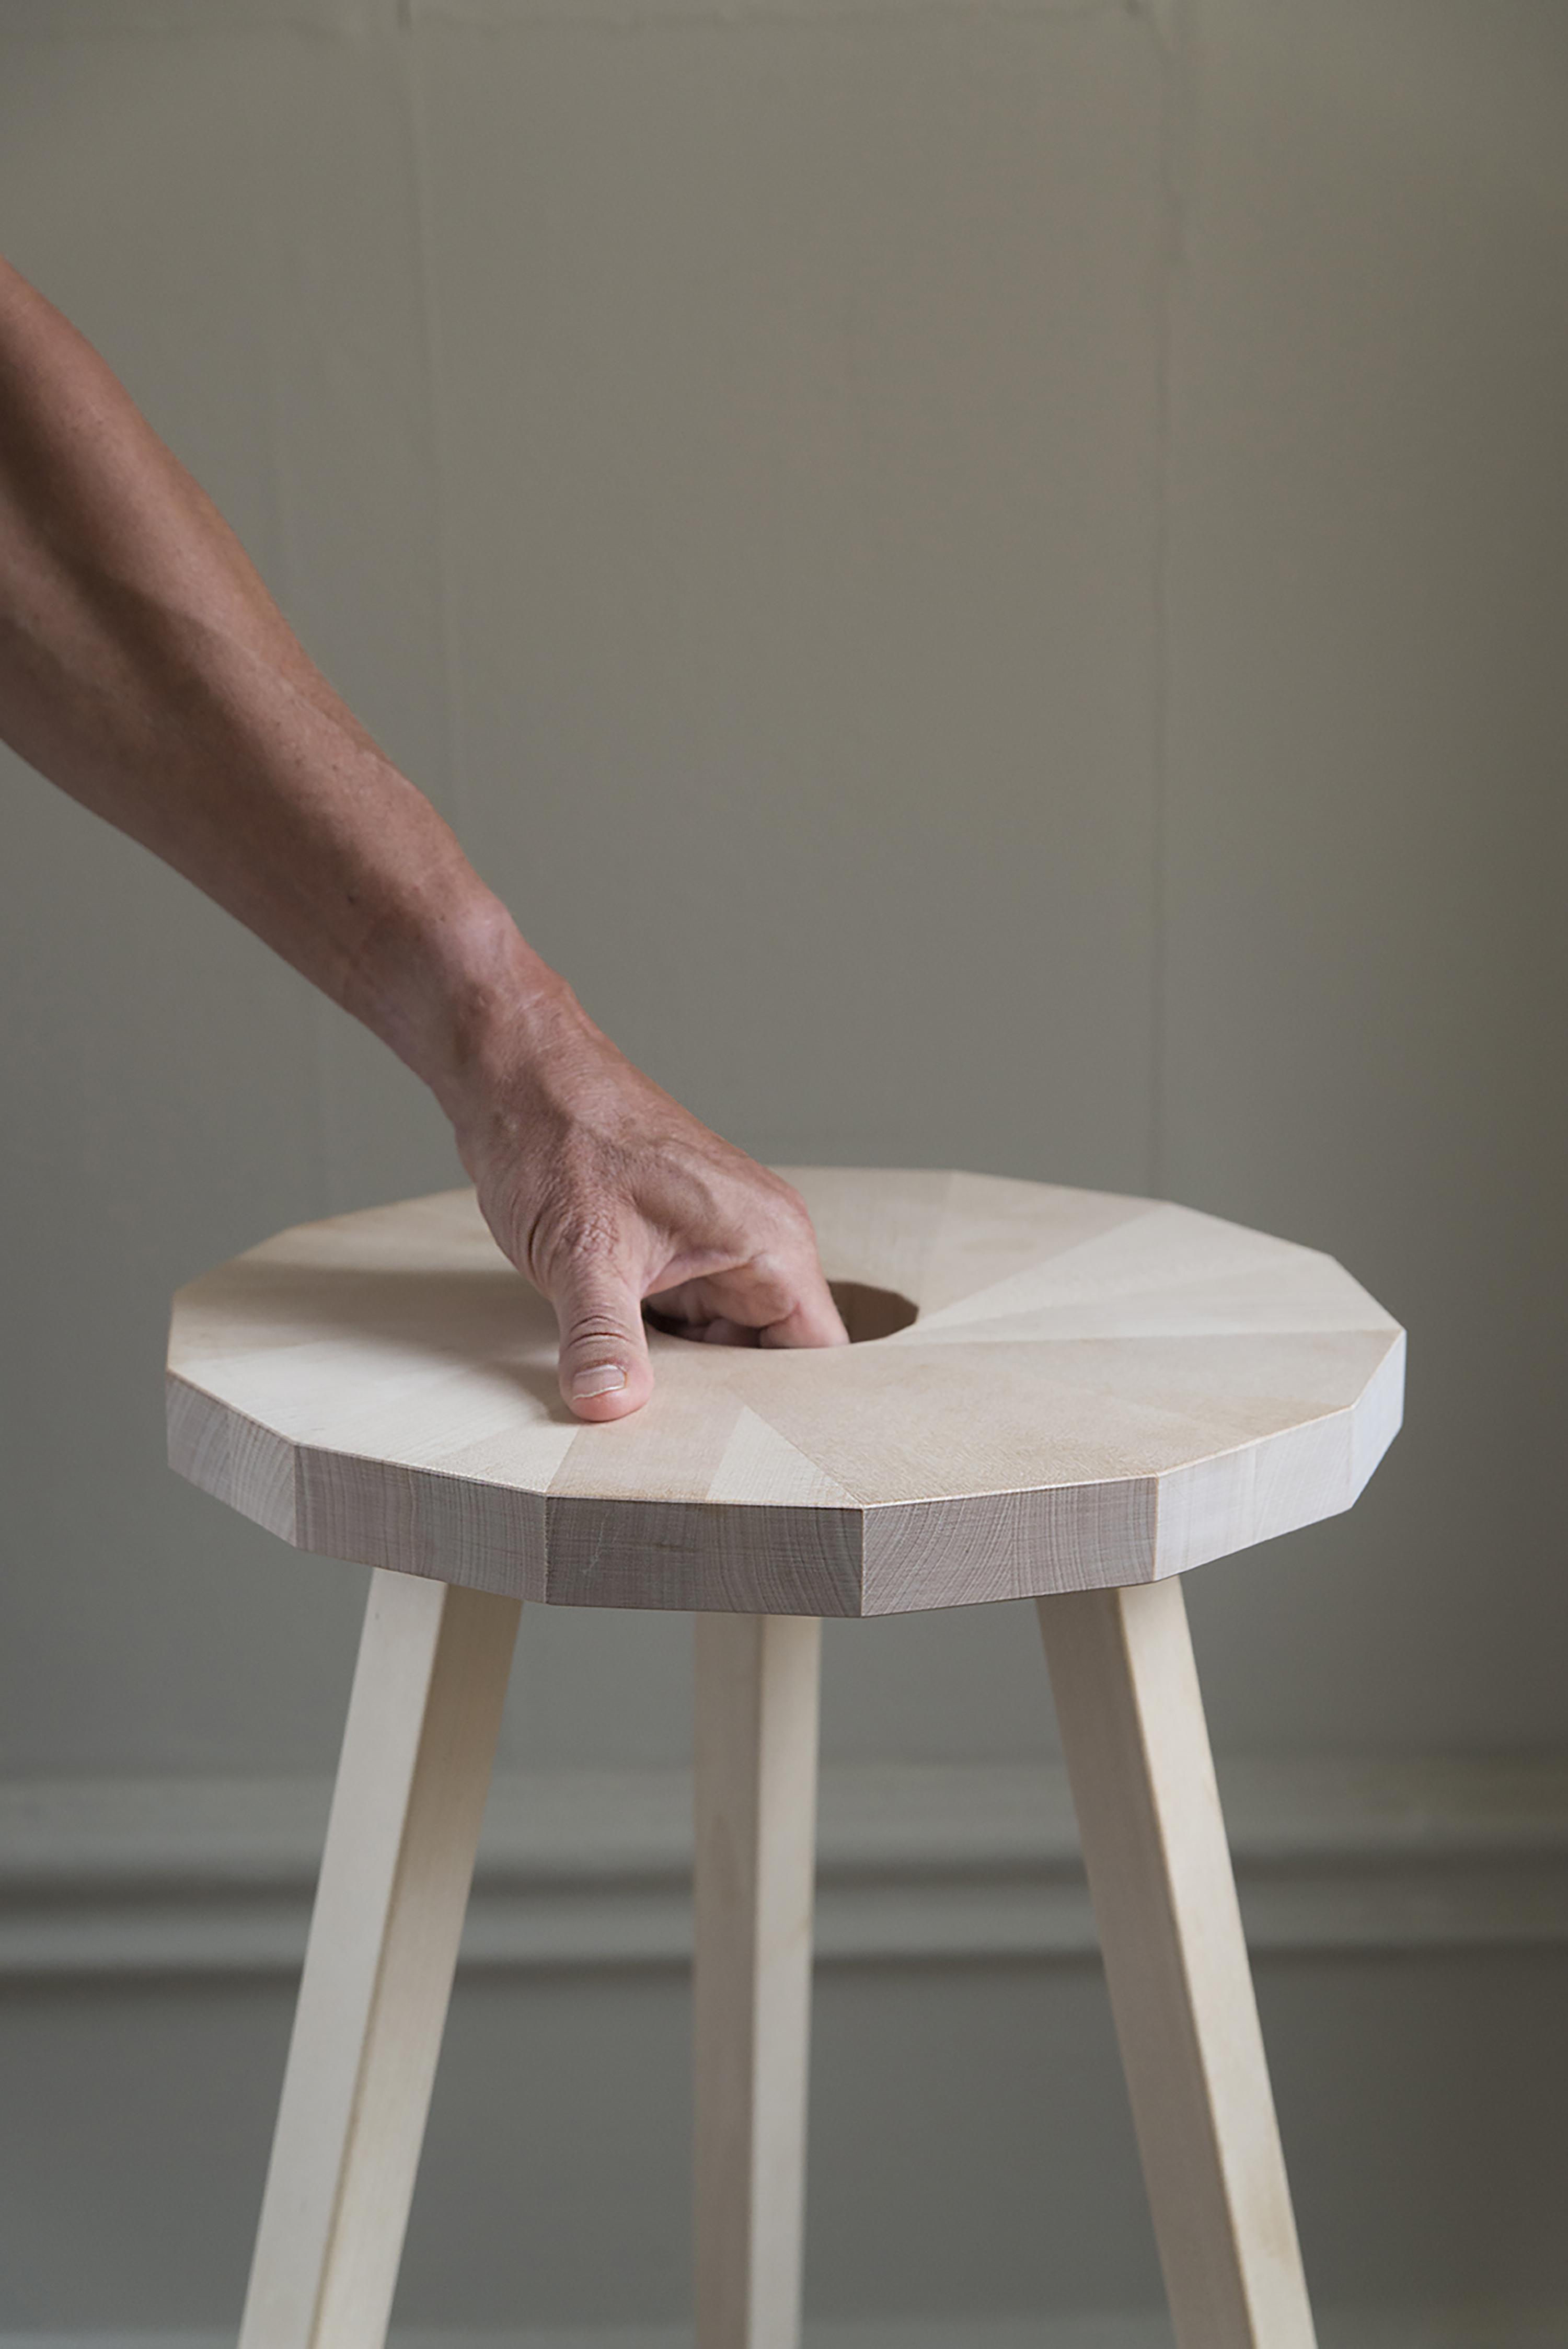 A photo of Lilla Snåland's stool, Circular future.